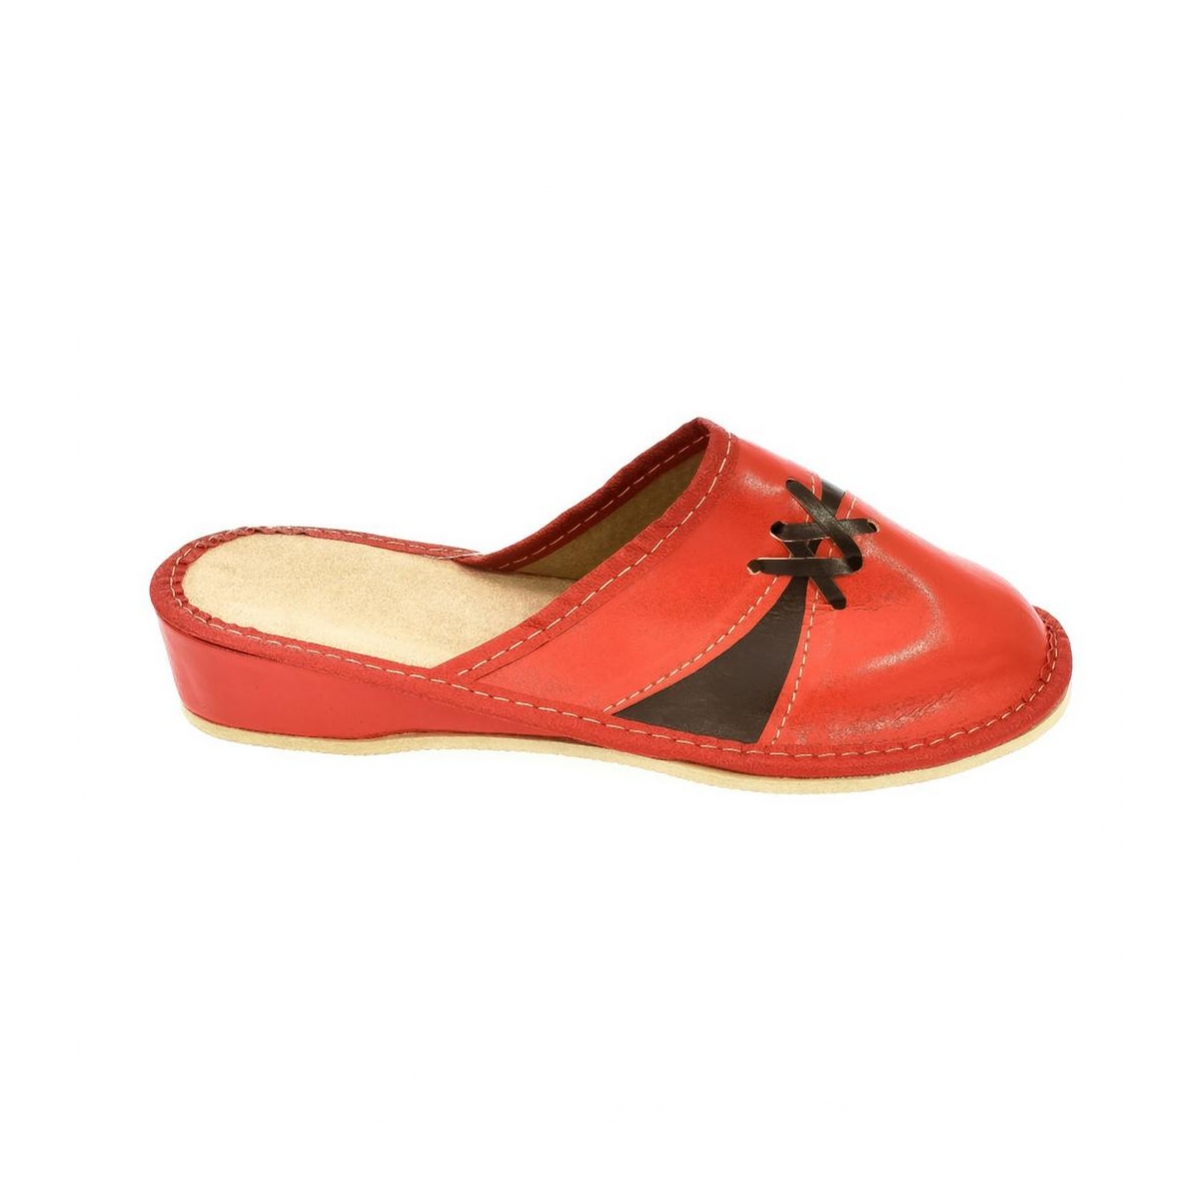 4fa3cc67aa23 Dámske kožené červené papuče ZORA - 4